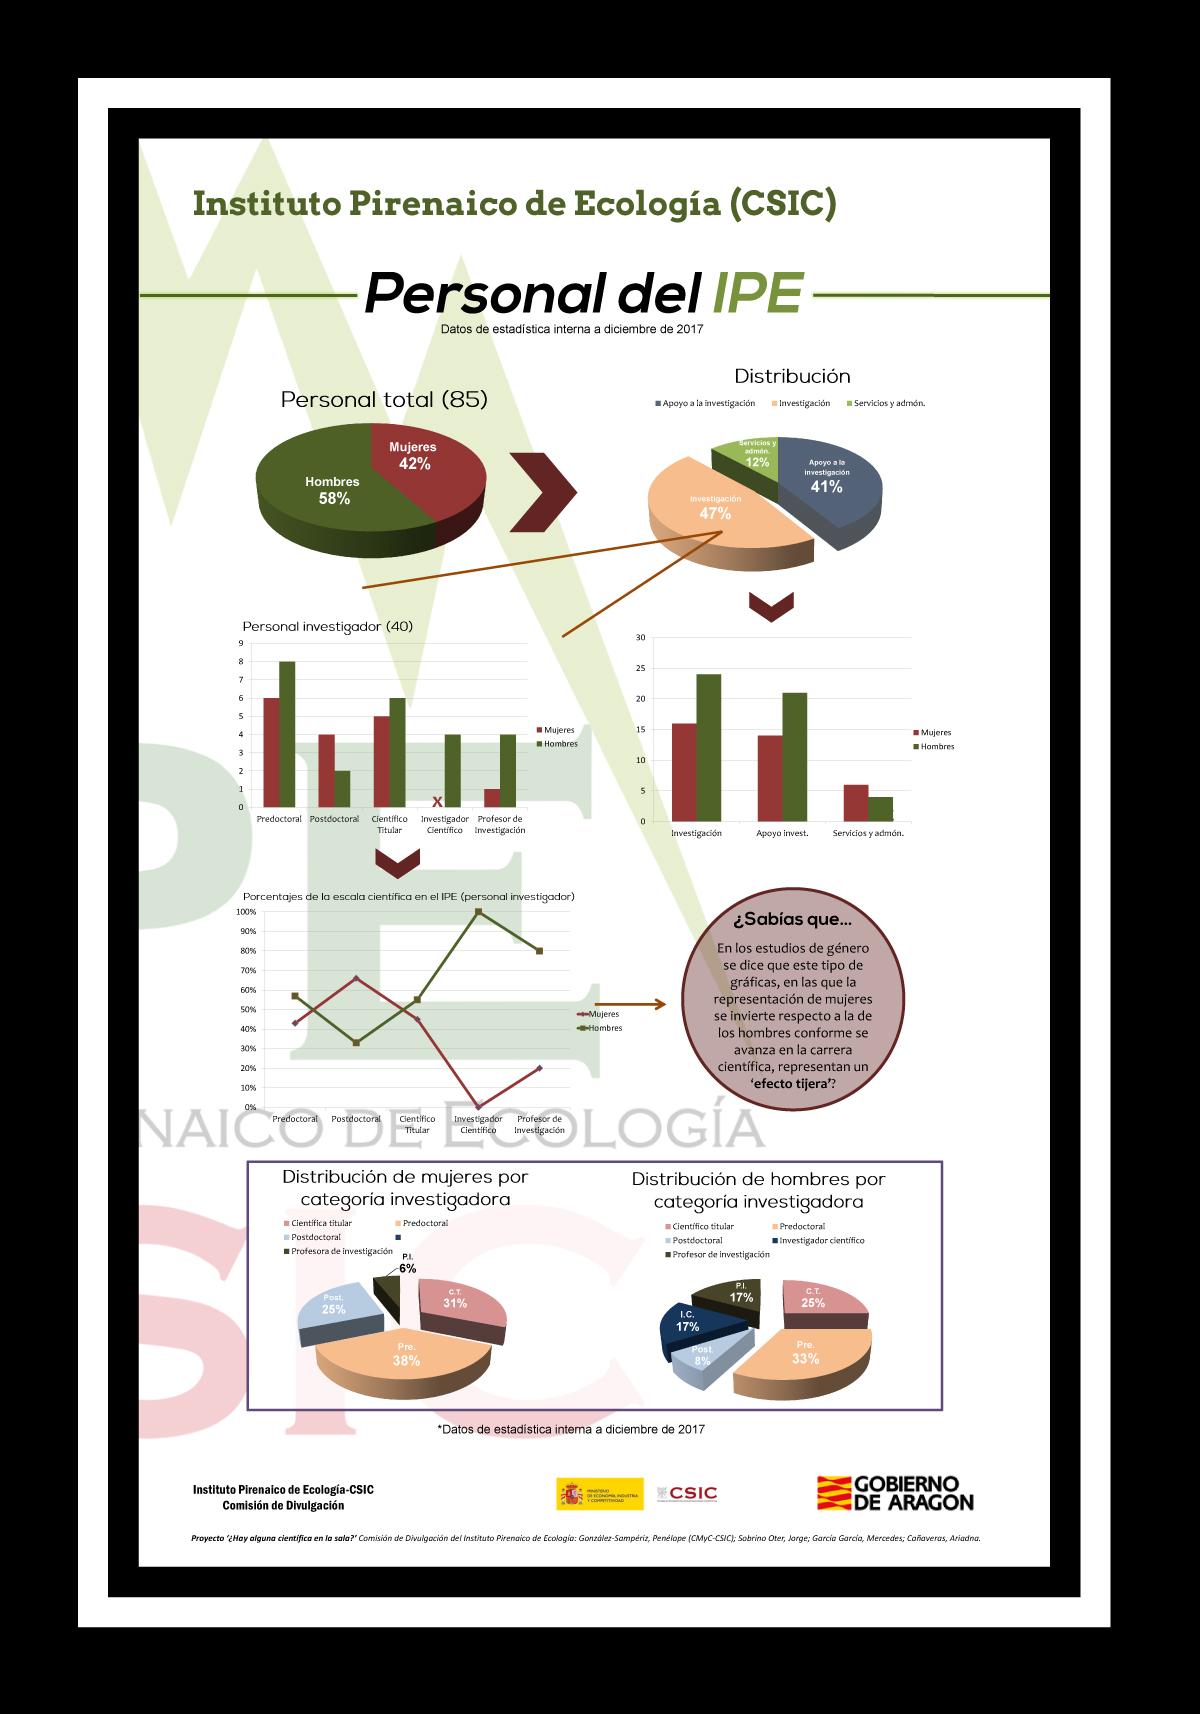 Personal del IPE